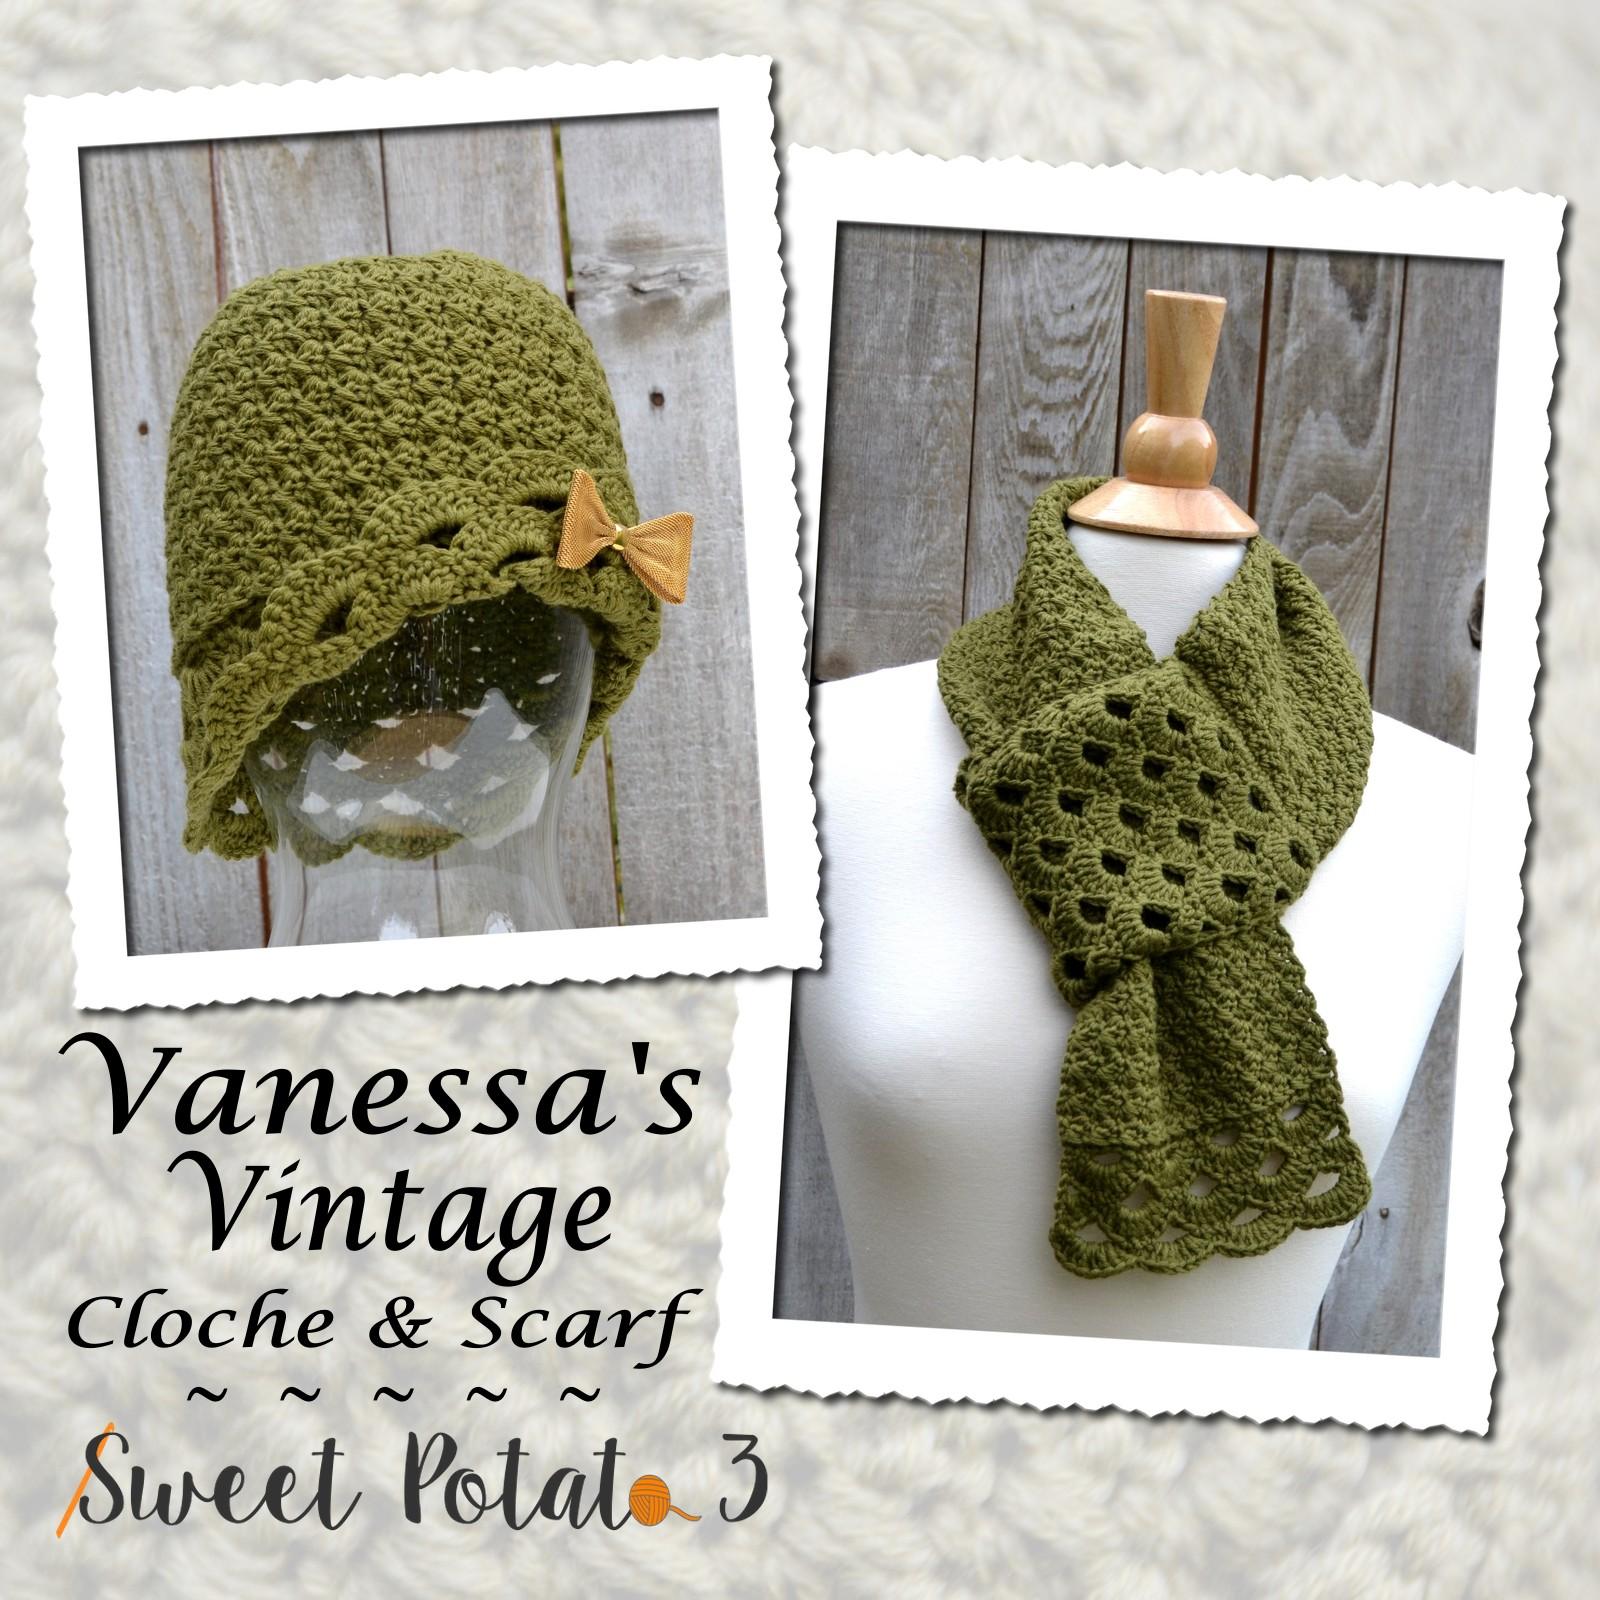 Vanessa's Vintage Cloche & Scarf